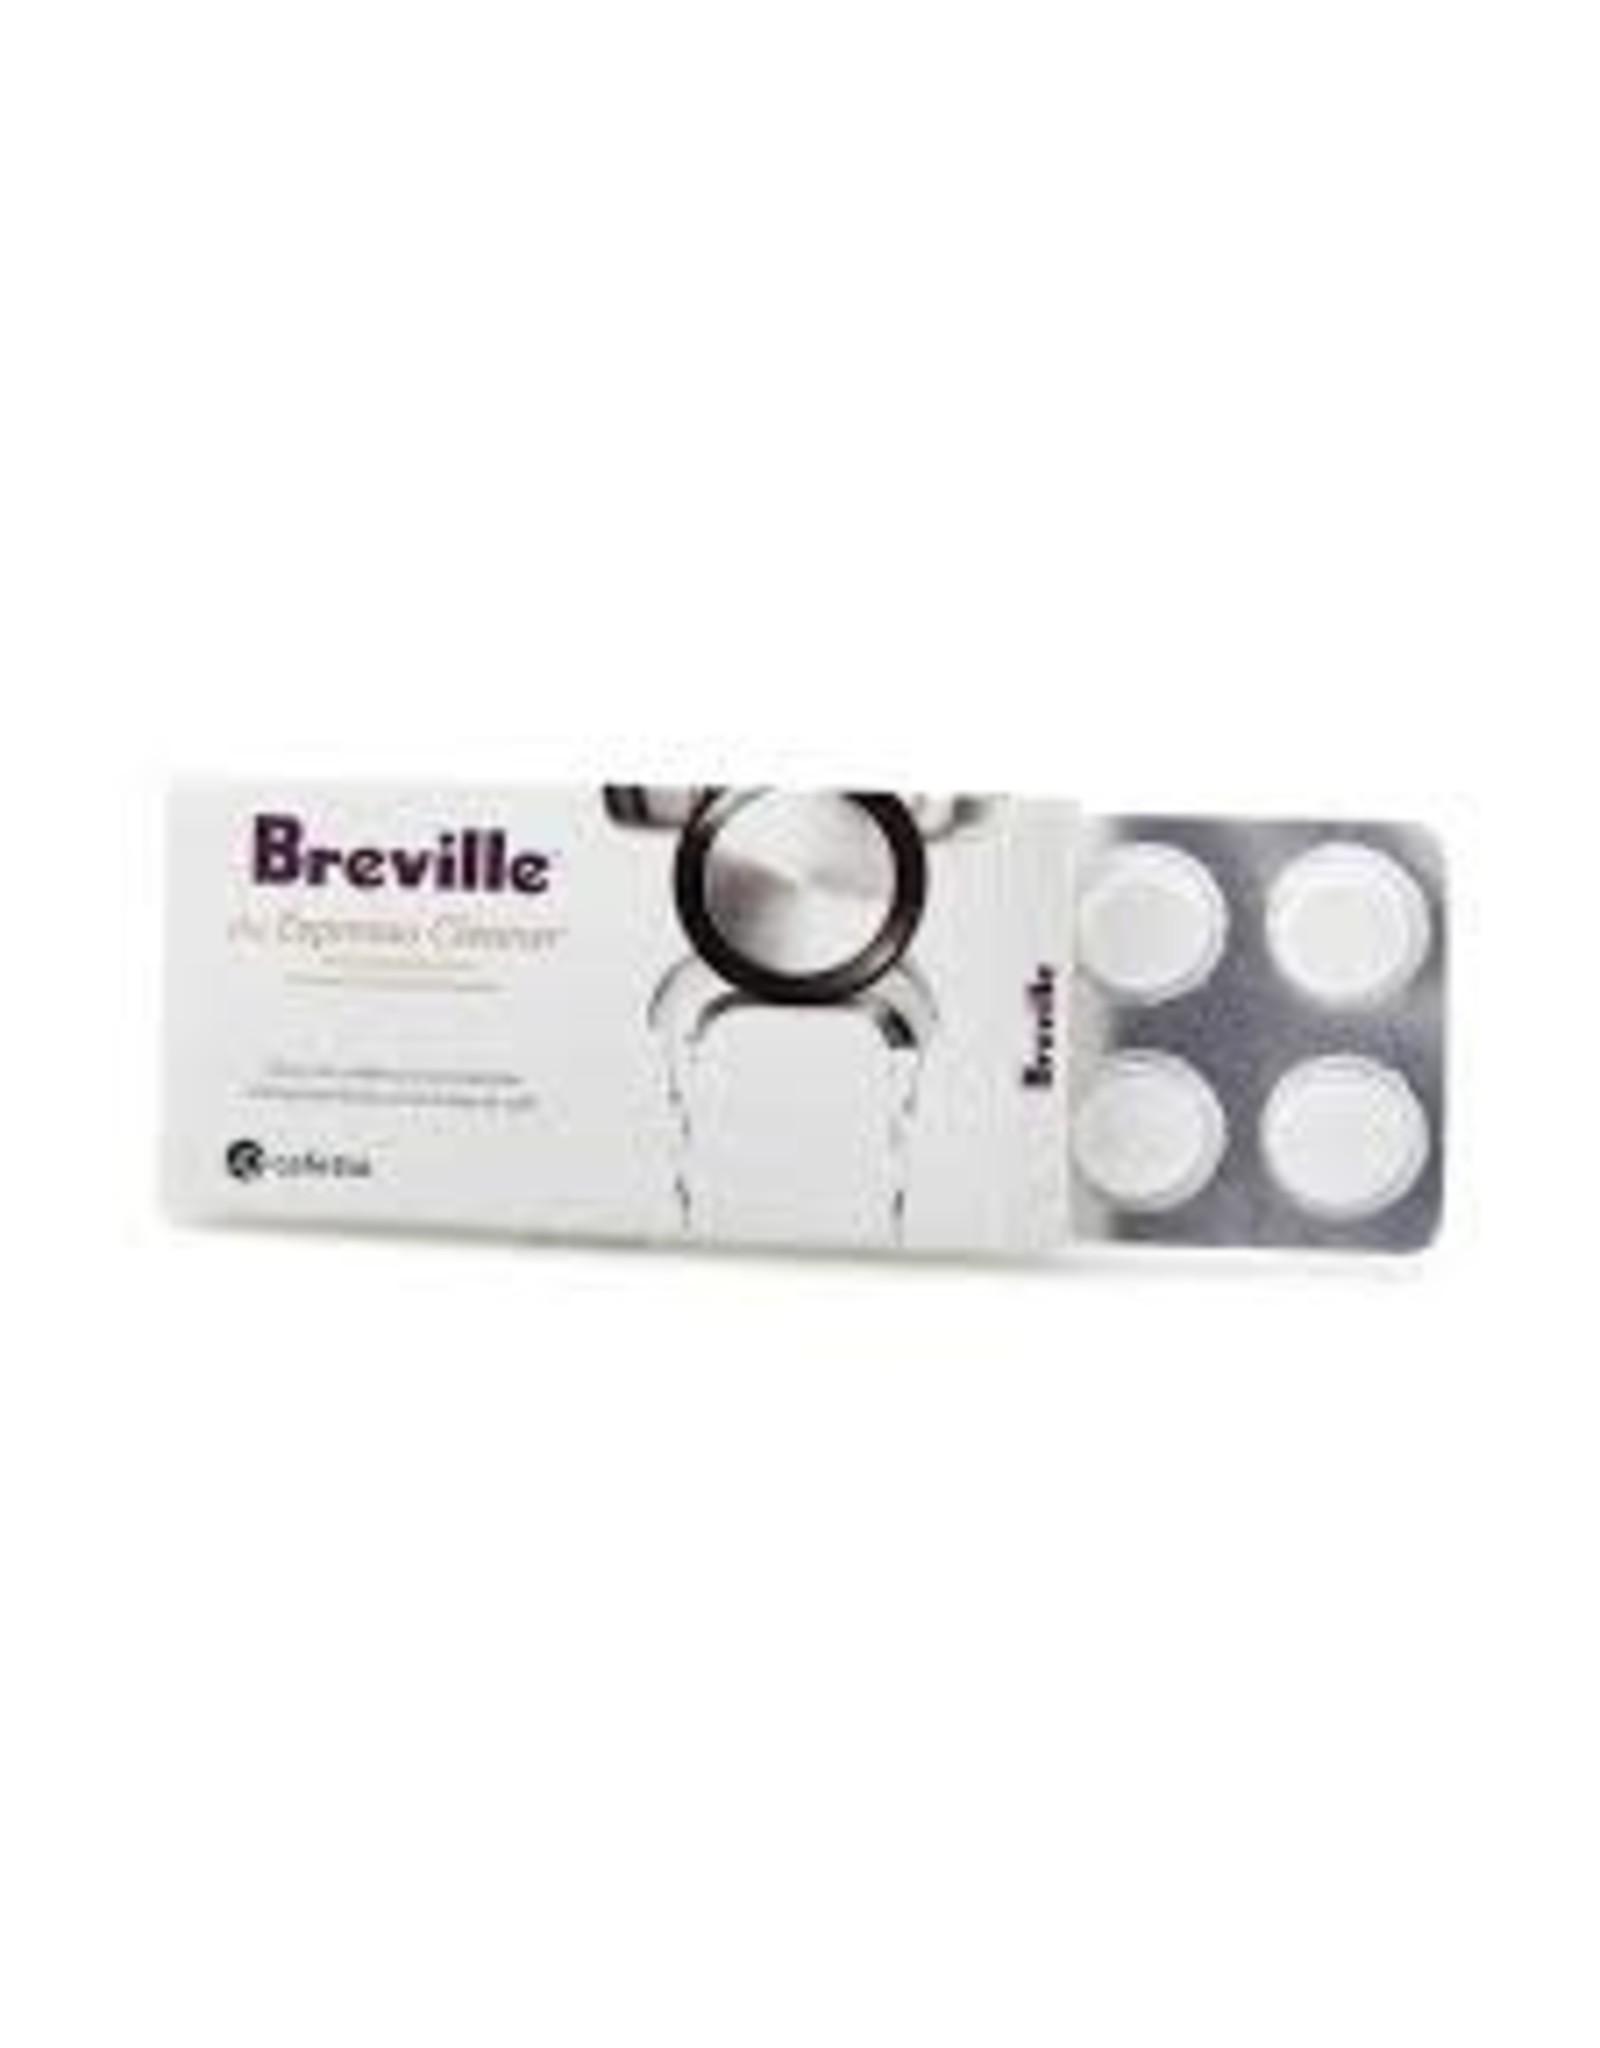 Breville BREVILLE Espresso Cleaning Tablets